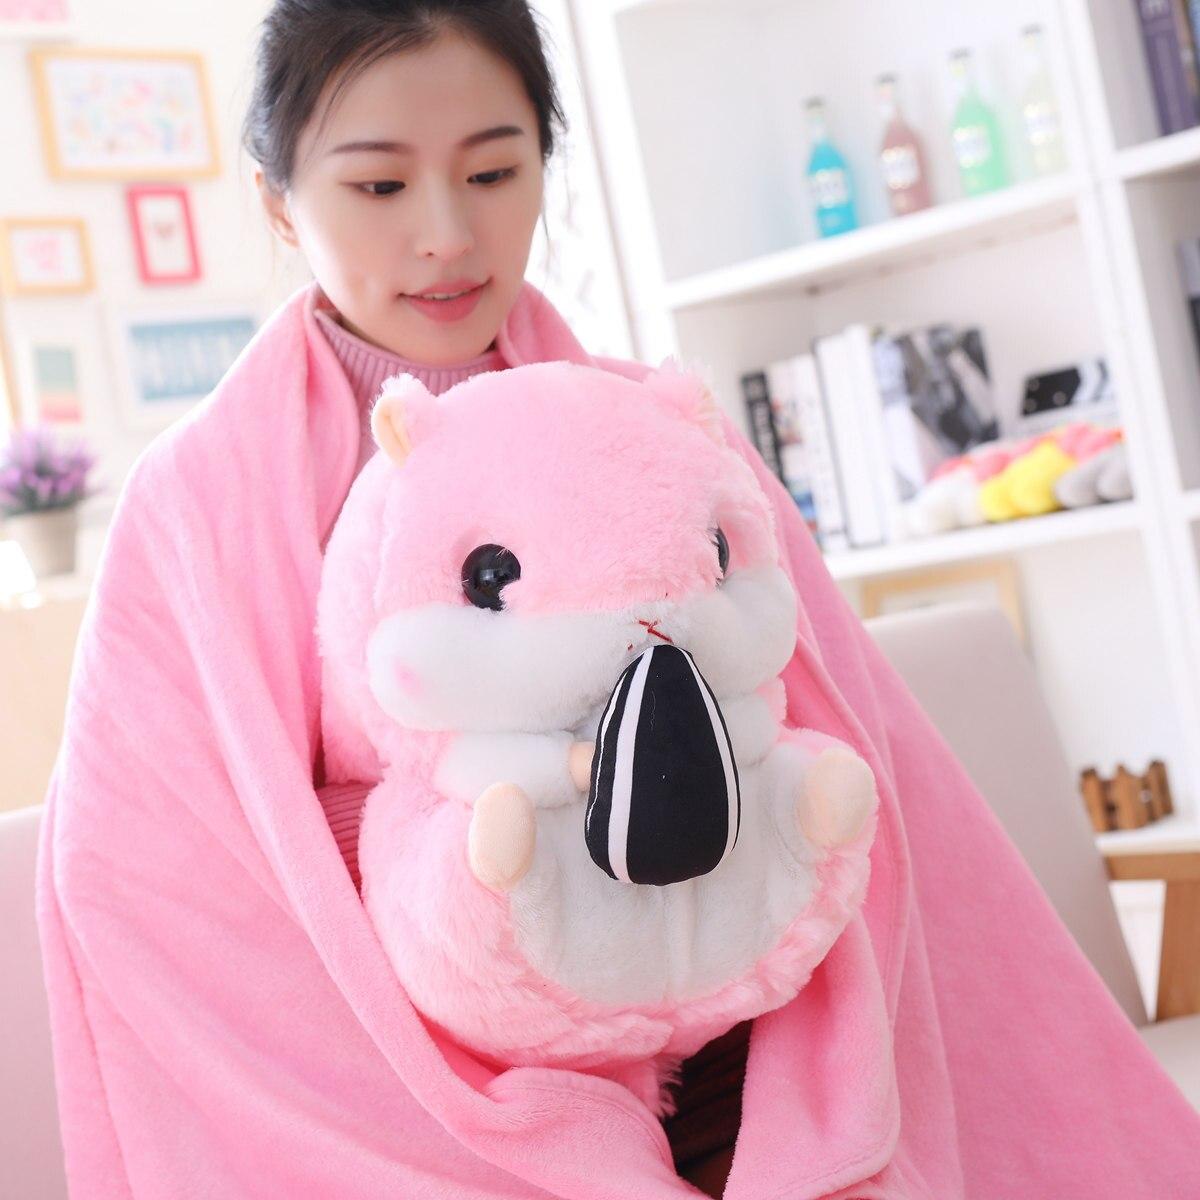 Dropshipping  3 in 1 hamster blanket plush animal soft toy hamster pillow hand warmer for kids